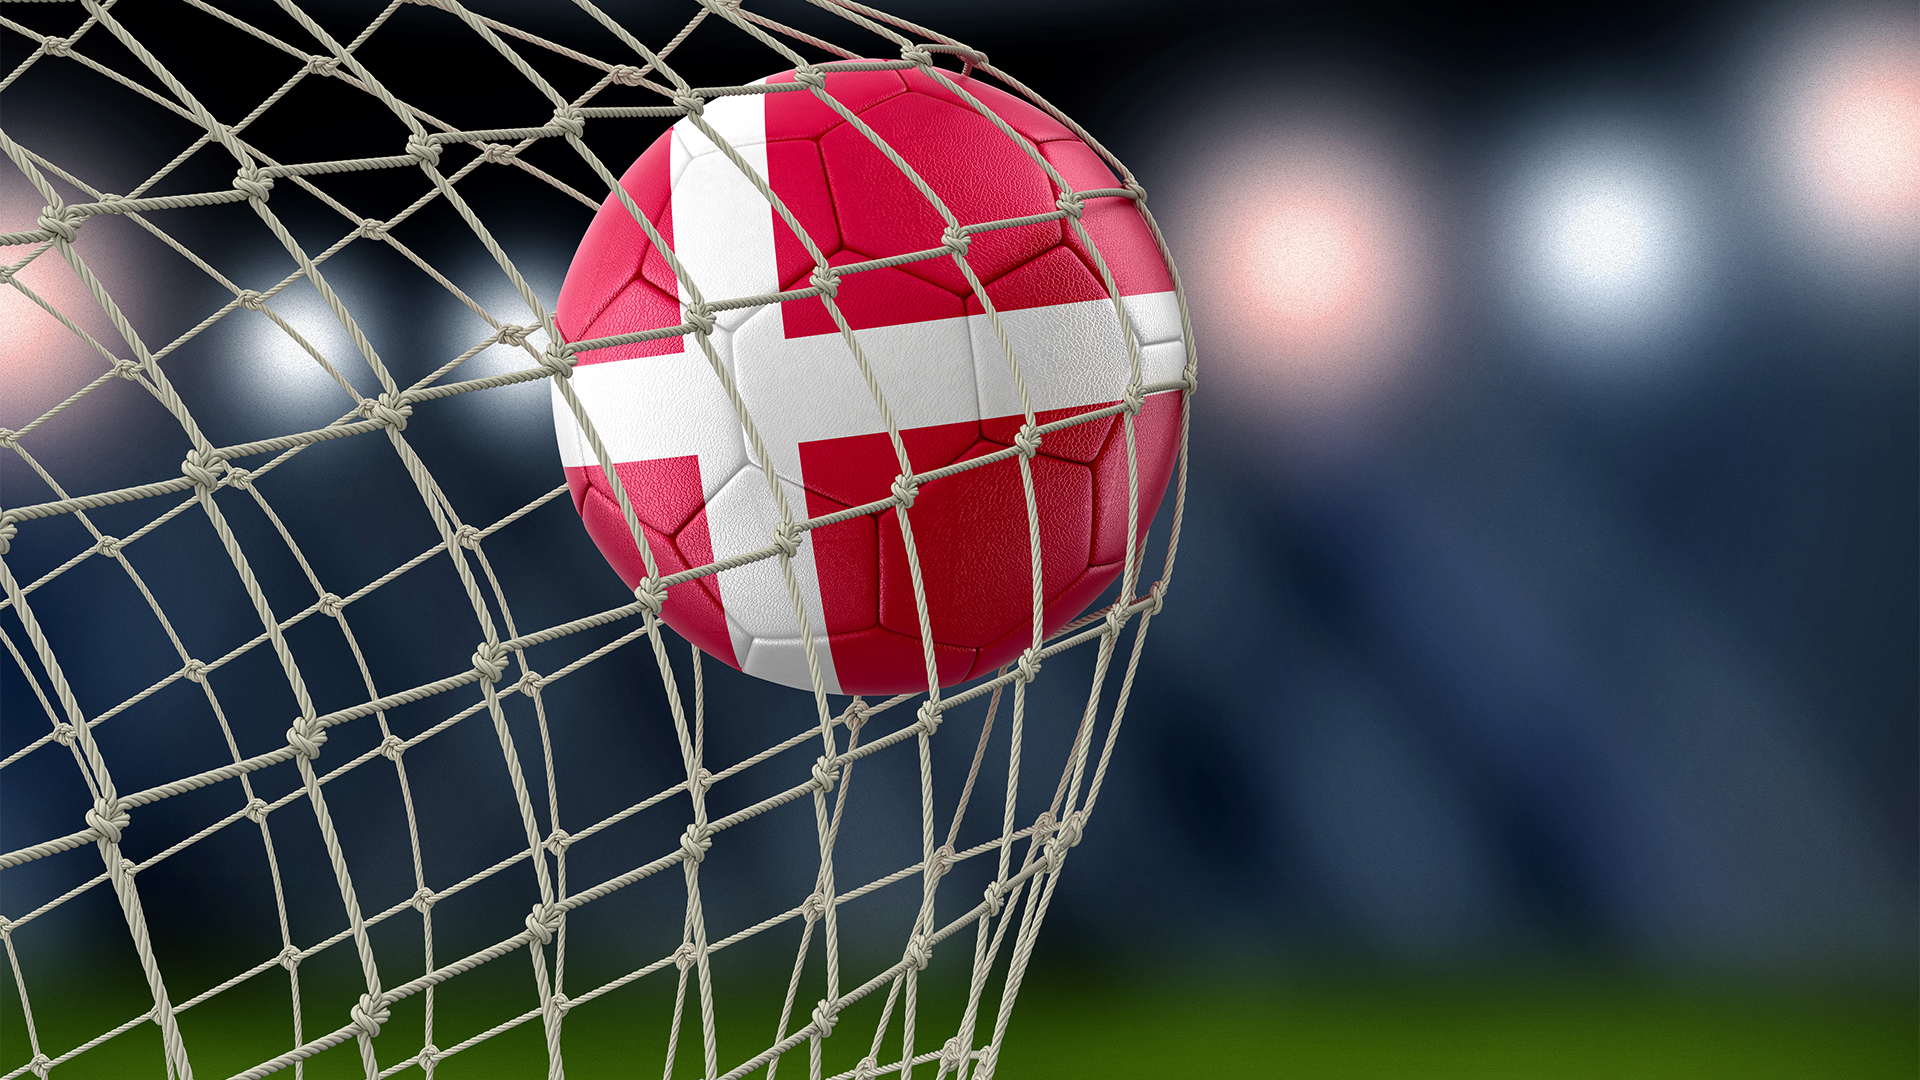 Kolde fadøl og EM-bold: Danmarks kampe vises på Havnefronten